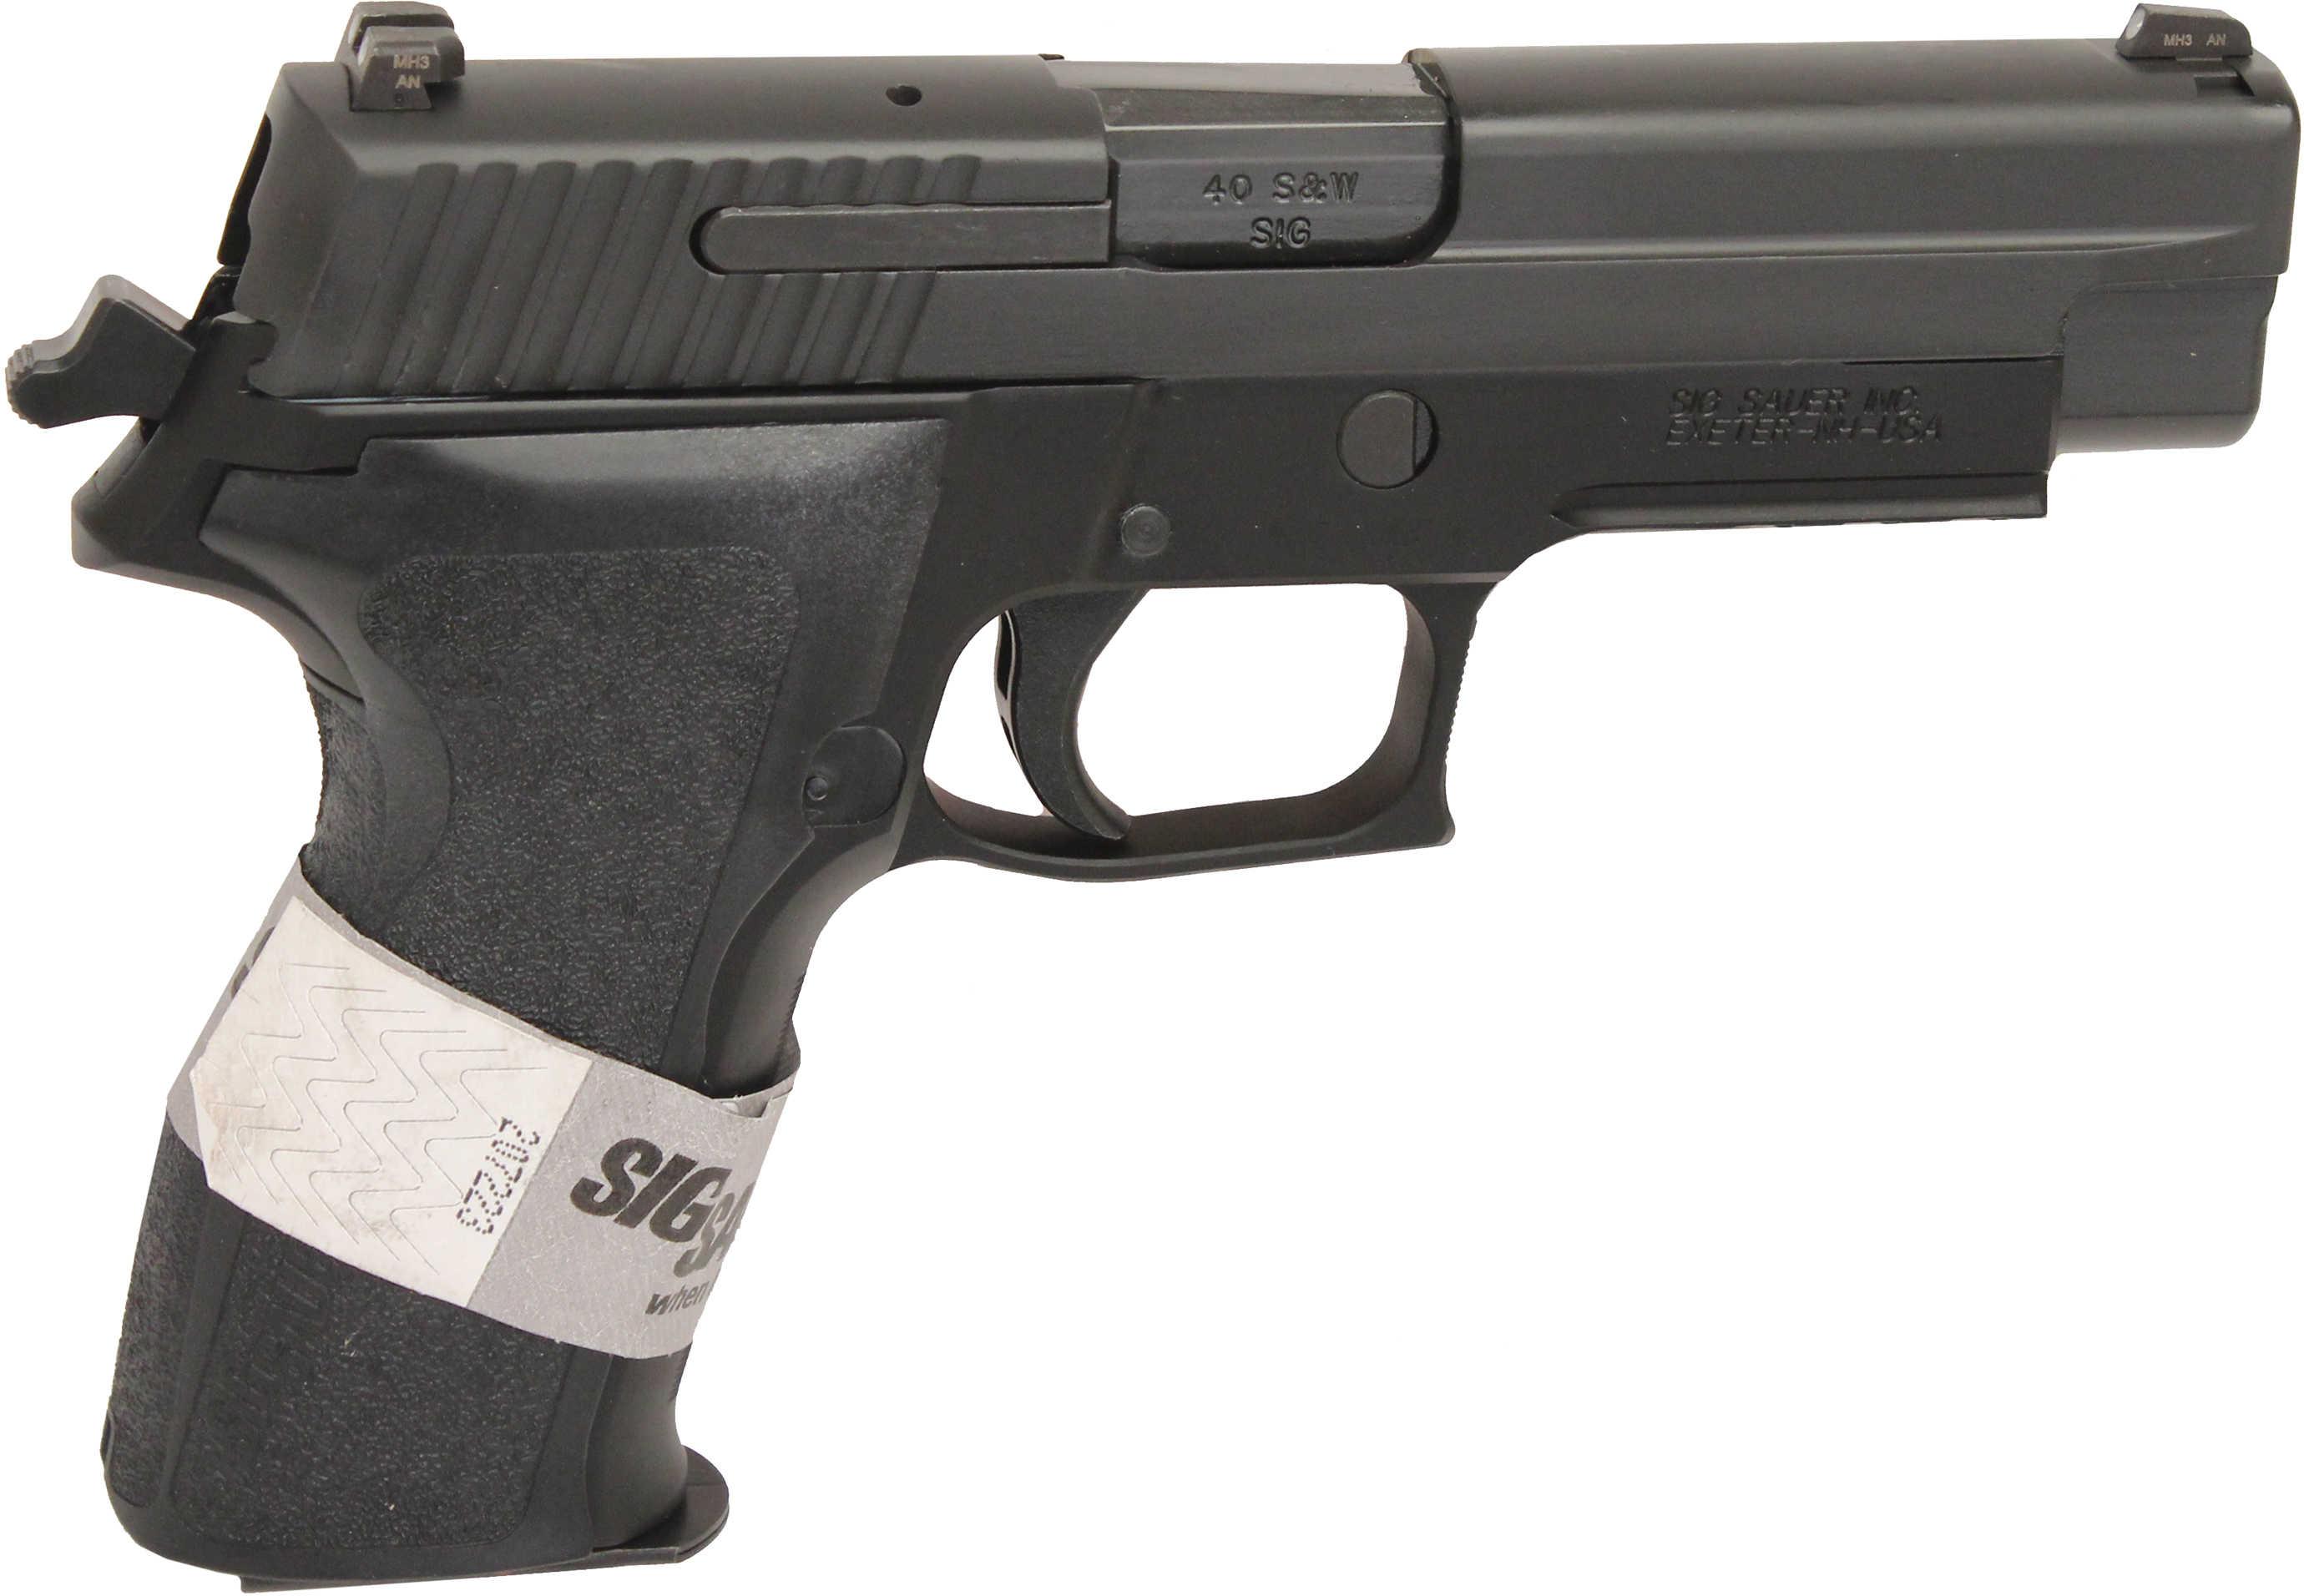 Sig Sauer P226 40 S&W Black E2 Polymer Grip 2-12 Round Mags Semi-Automatic Pistol E26R40BSS